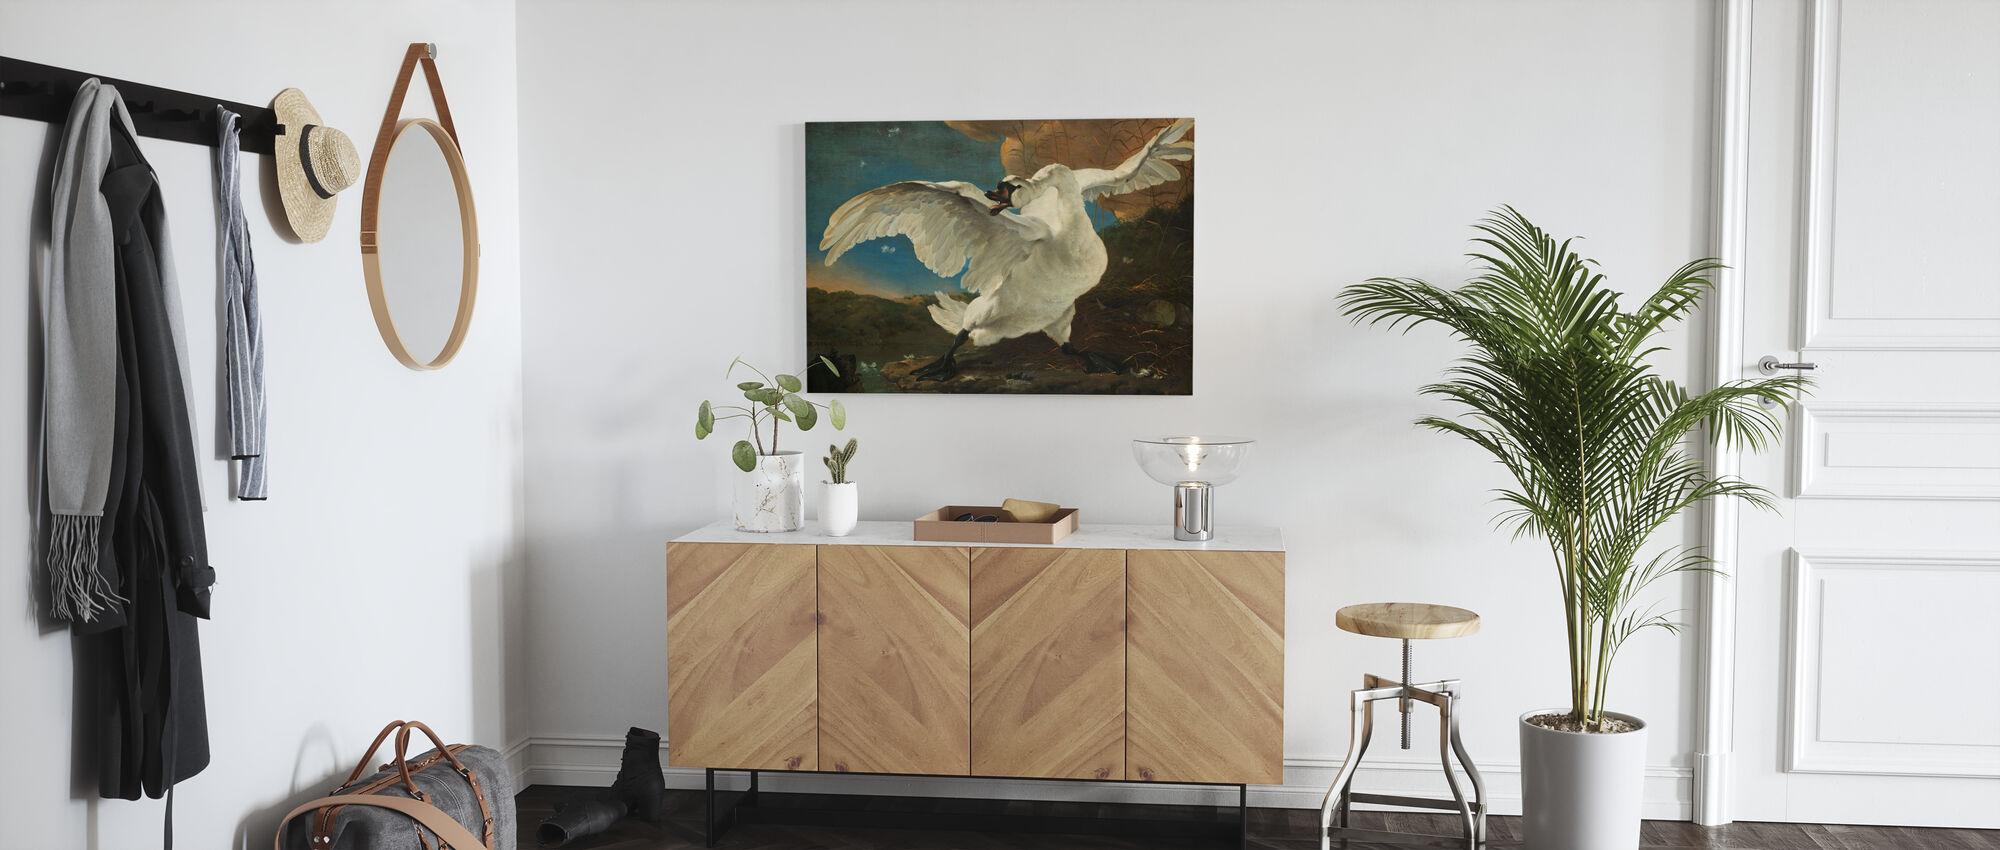 Threatened Swan - Canvas print - Hallway